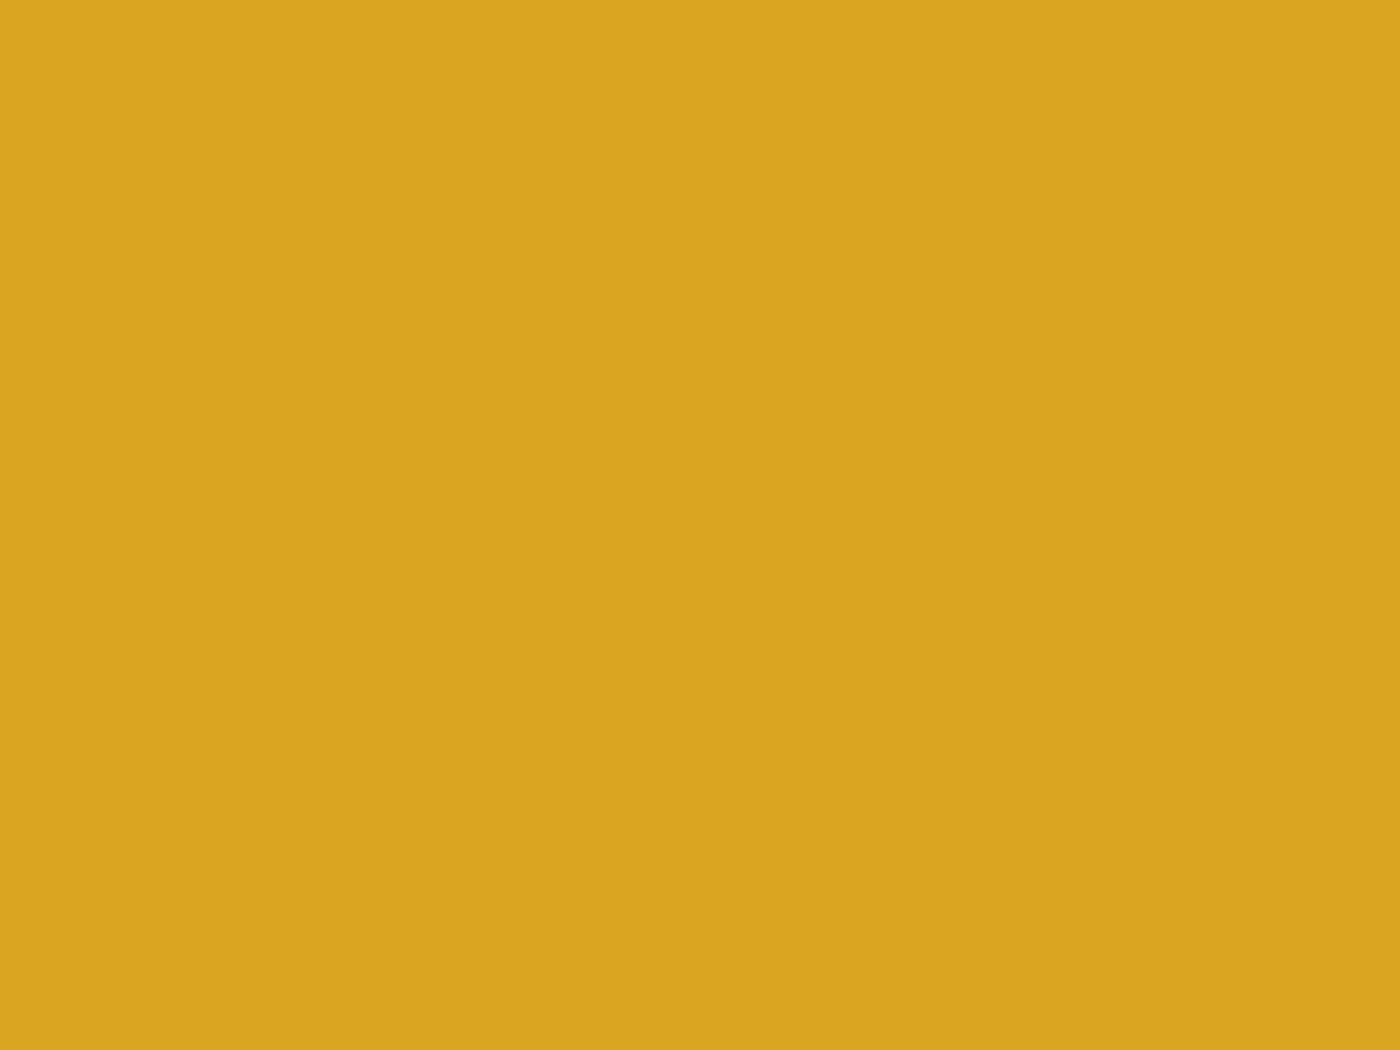 1400x1050 Goldenrod Solid Color Background